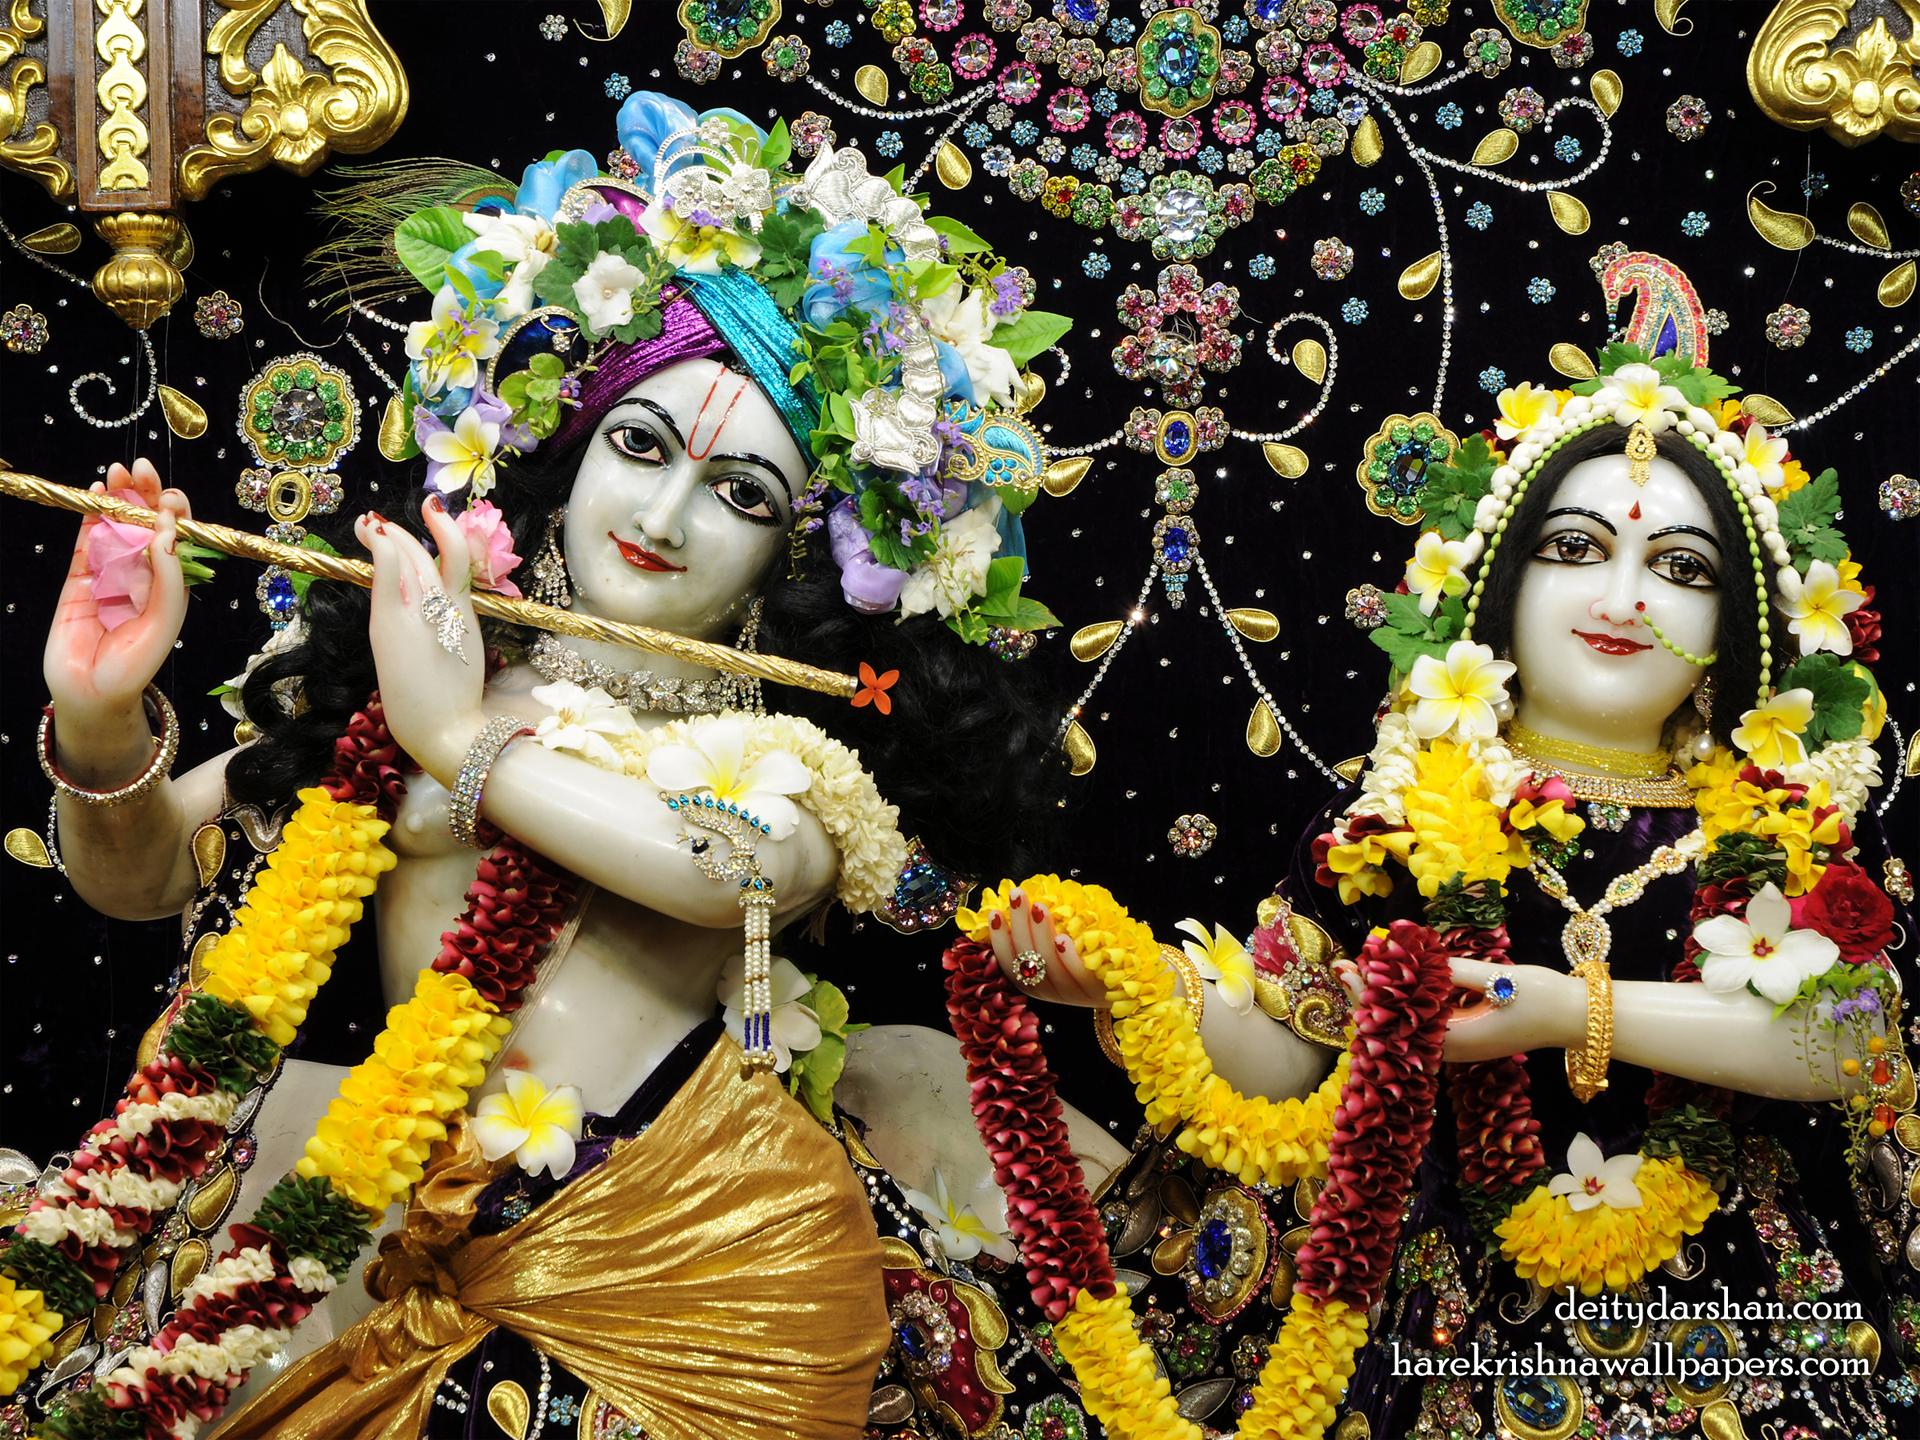 Sri Sri Radha Gopinath Close up Wallpaper (067) Size 1920x1440 Download